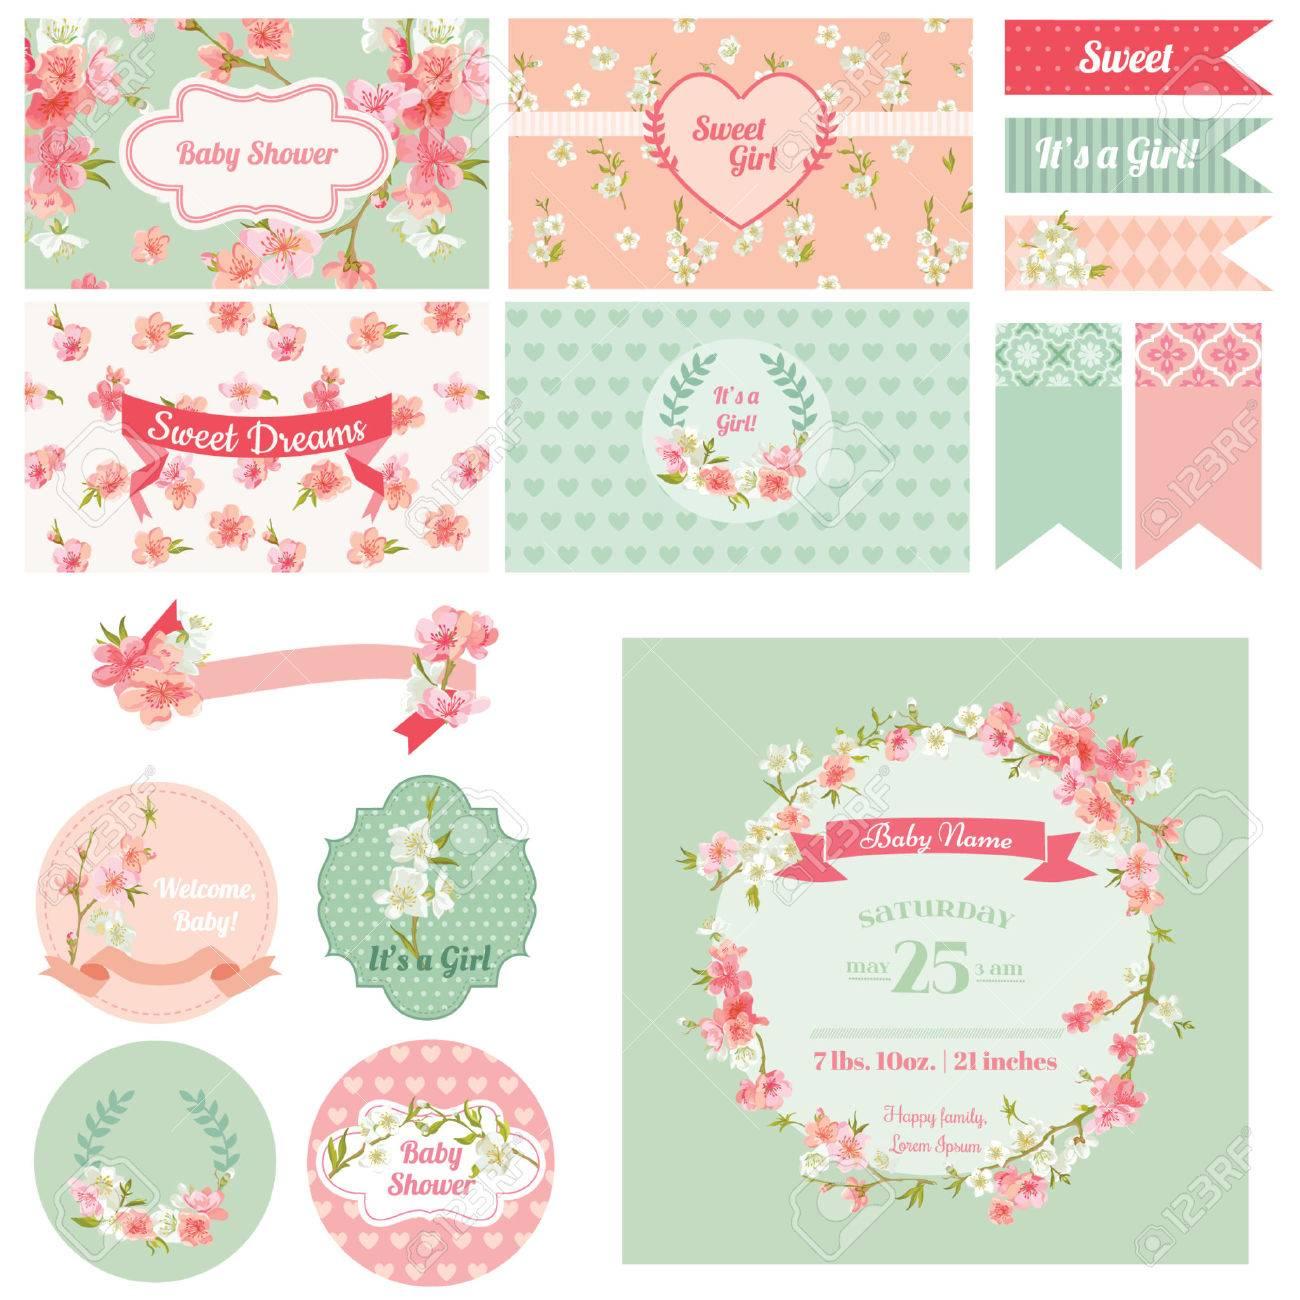 Lbum De Recortes Elementos De Diseño Baby Shower Flower Theme Vector